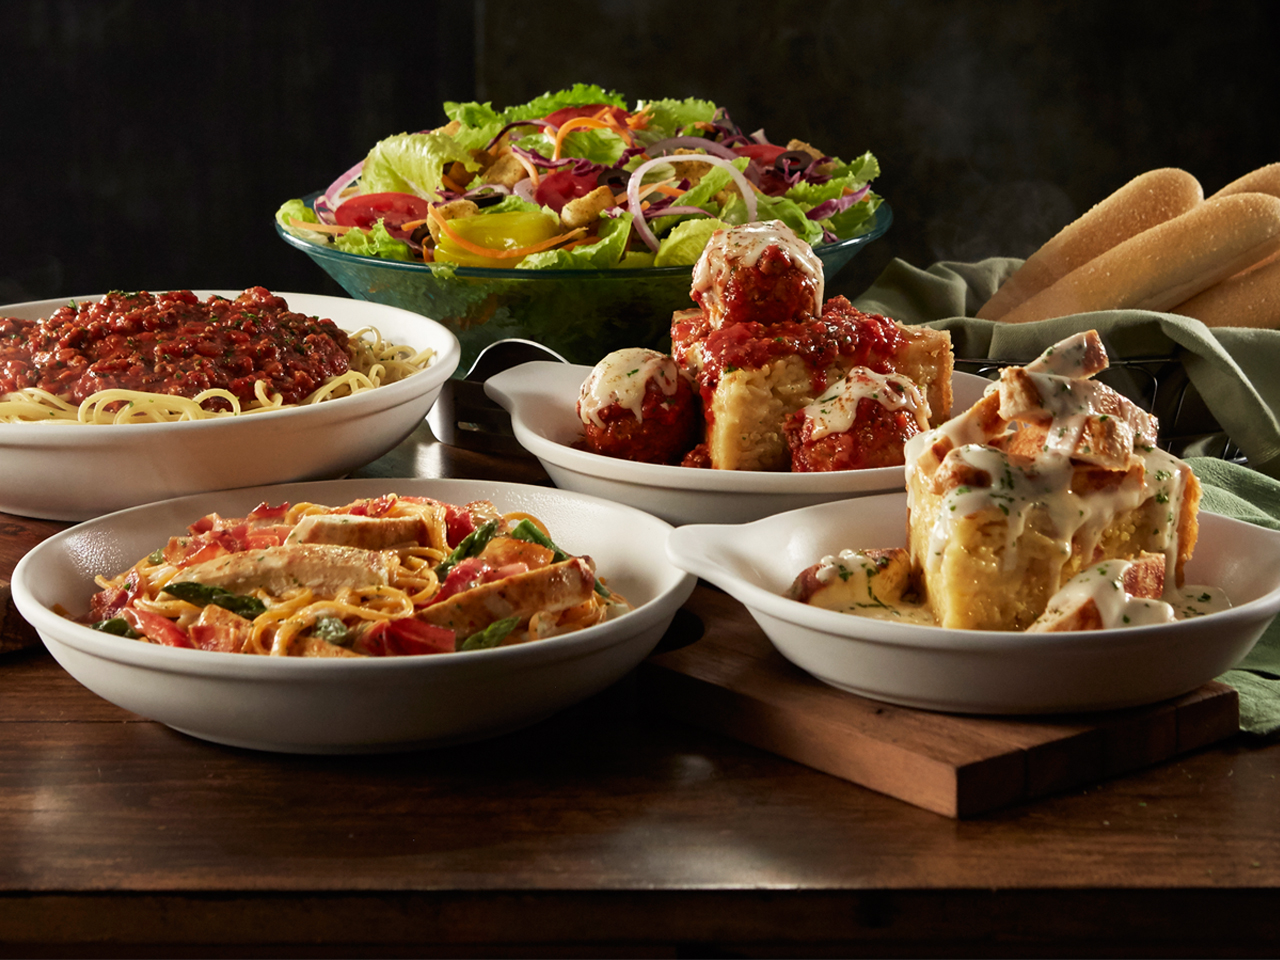 Olive Garden Italian Restaurant, Wilkes Barre PA